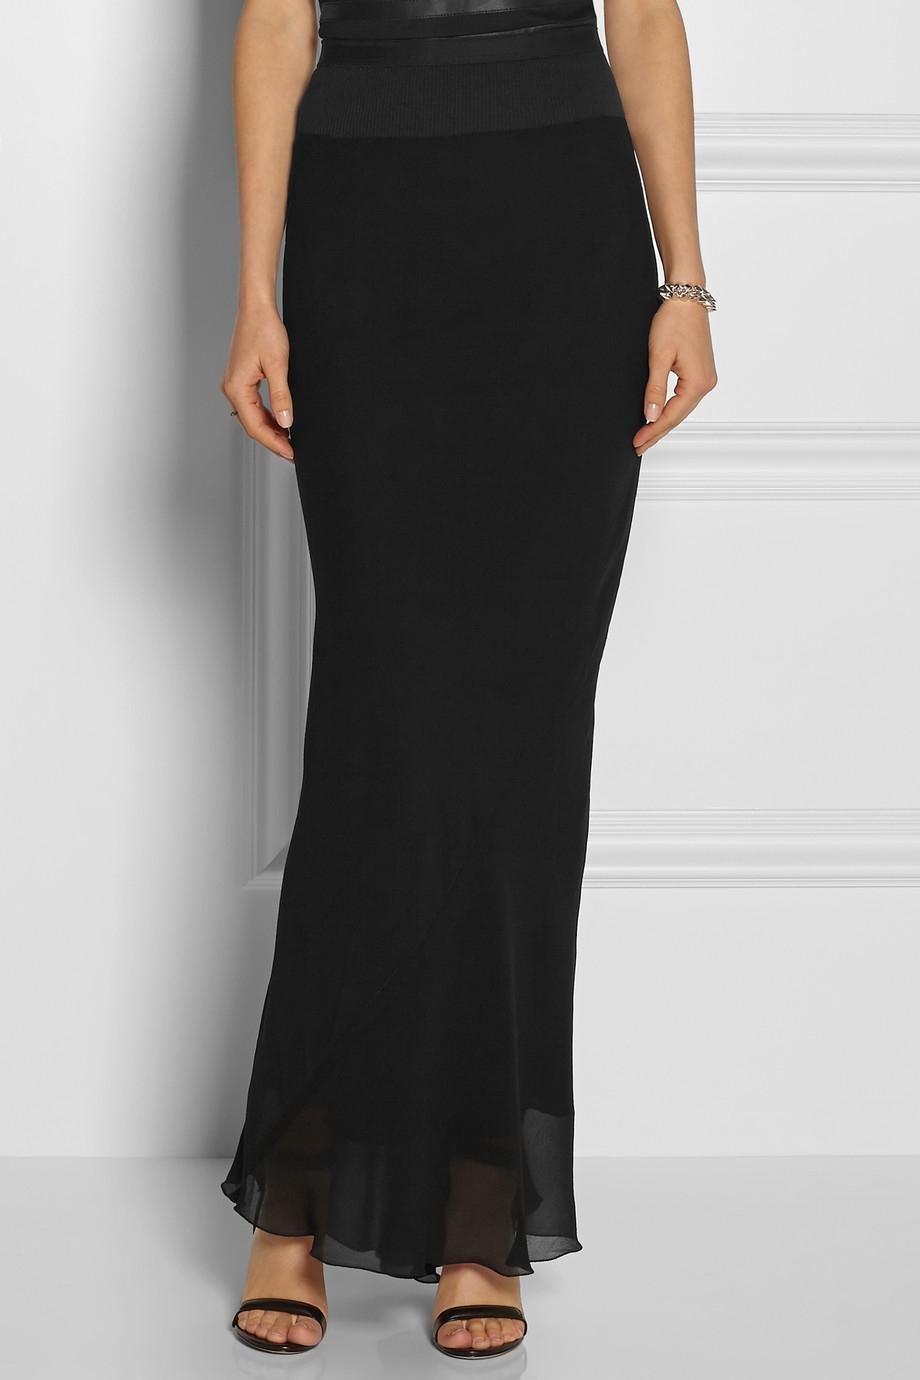 Rick owens Silk Georgette Maxi Skirt in Black | Lyst